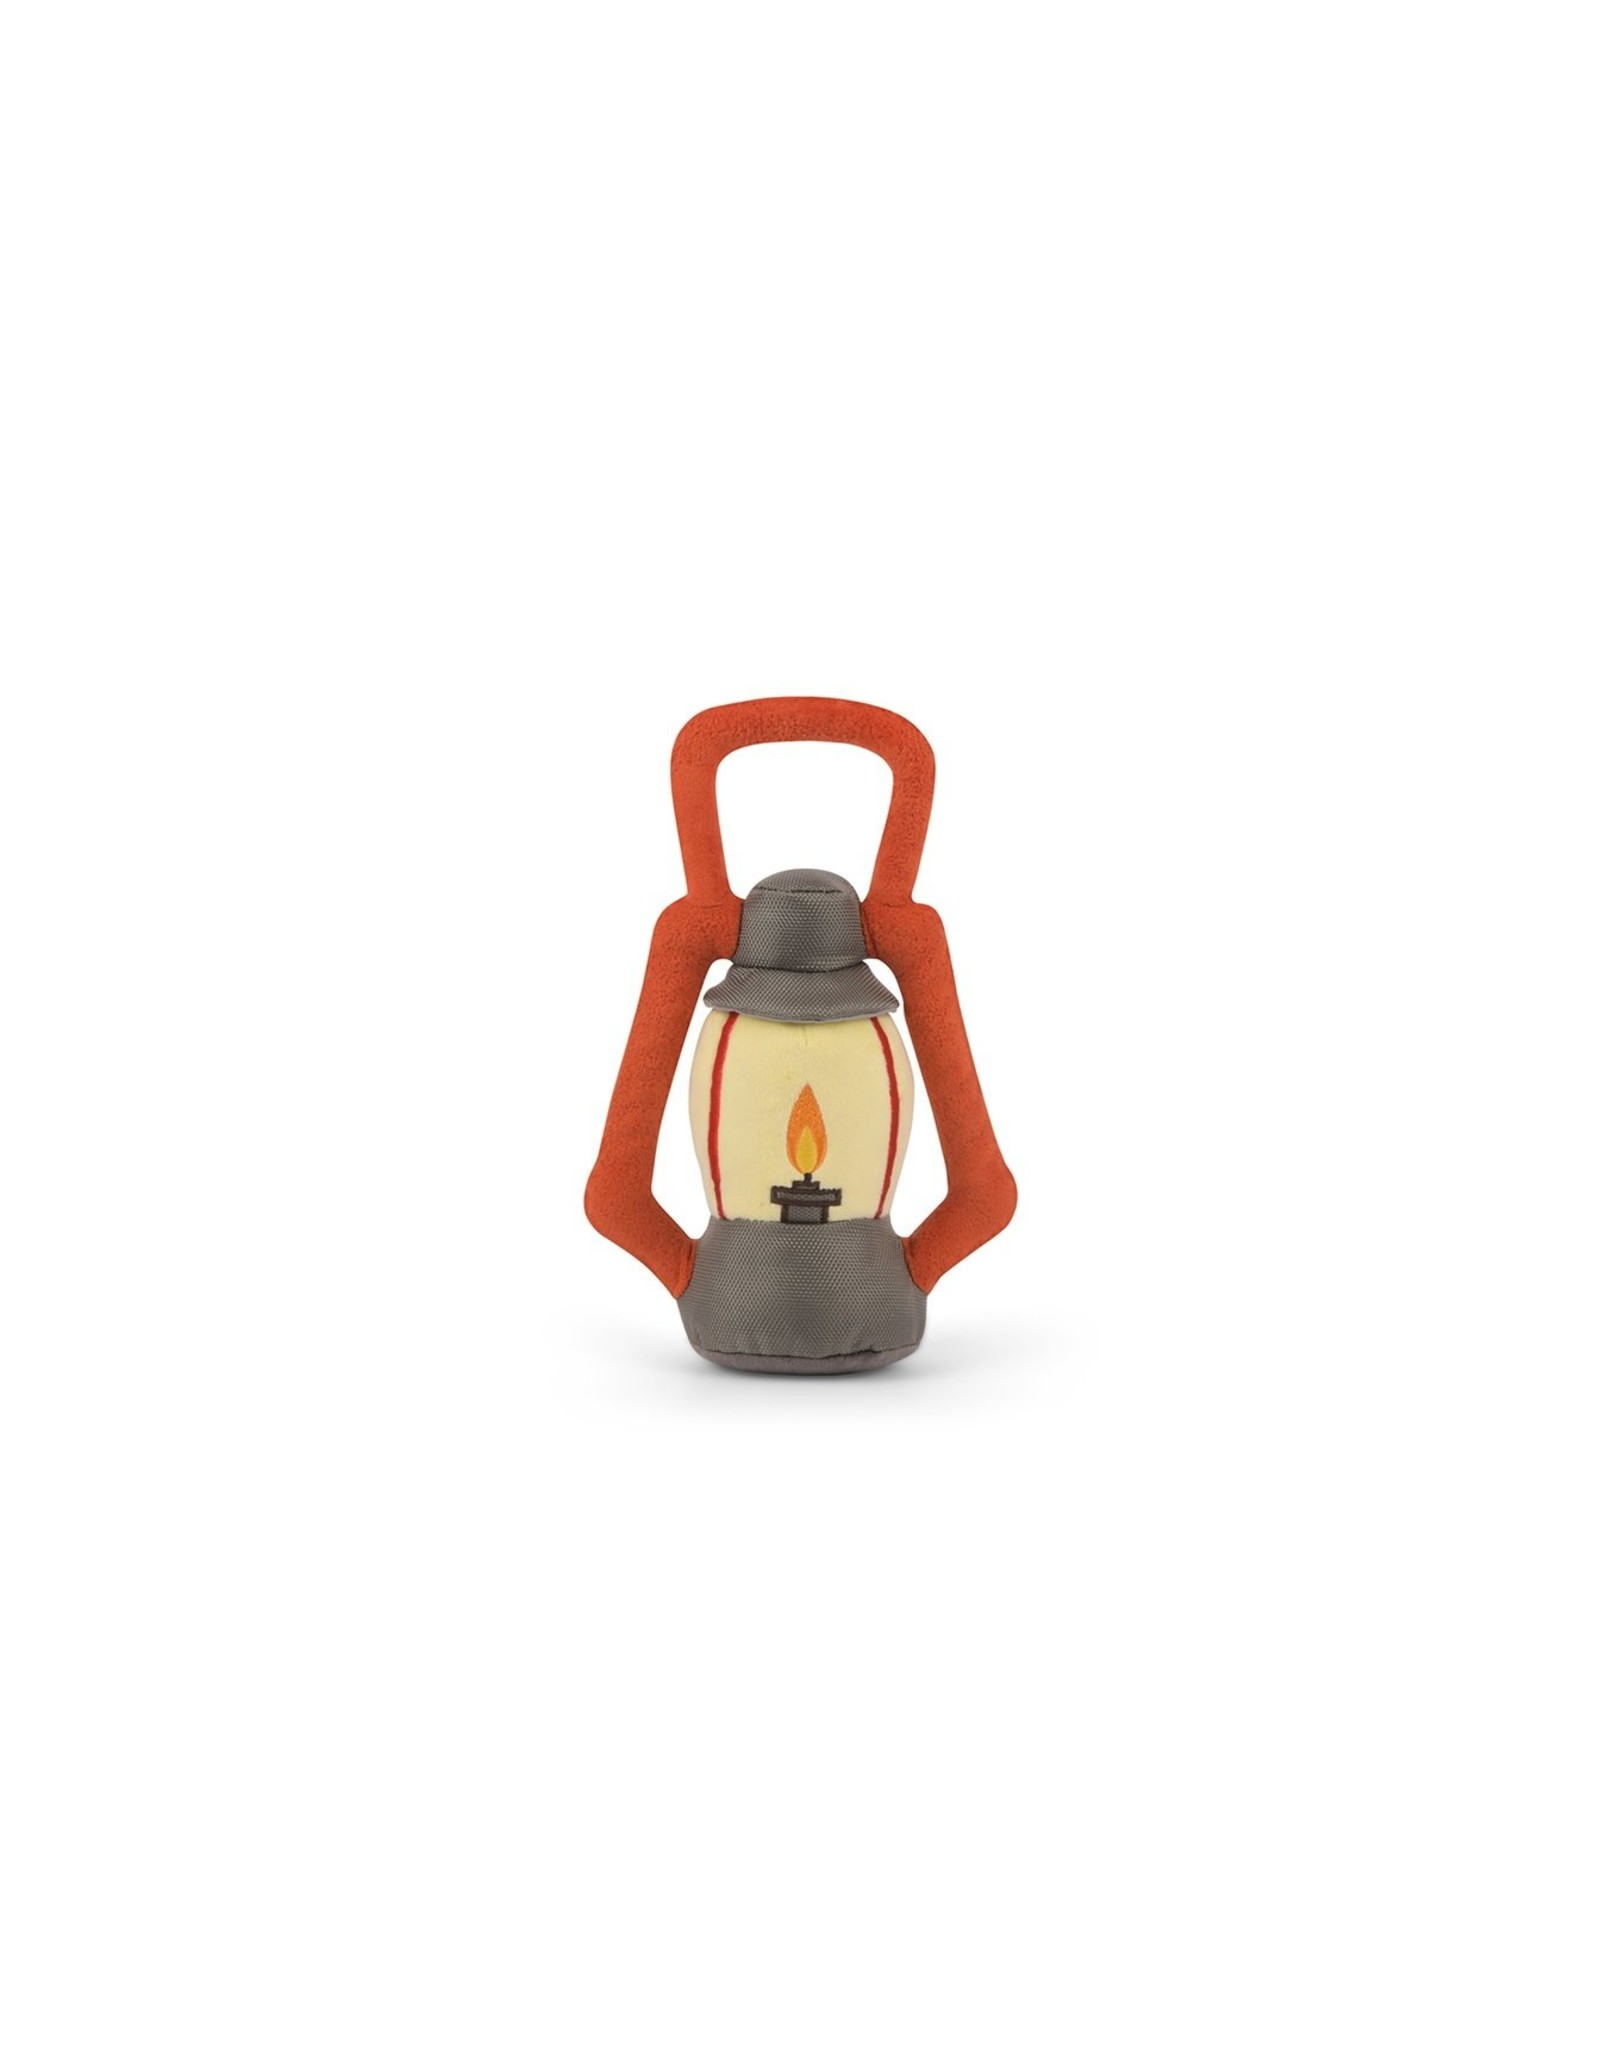 PLAY Pet Lifestyle Camp Corbin Pack Leader Lantern